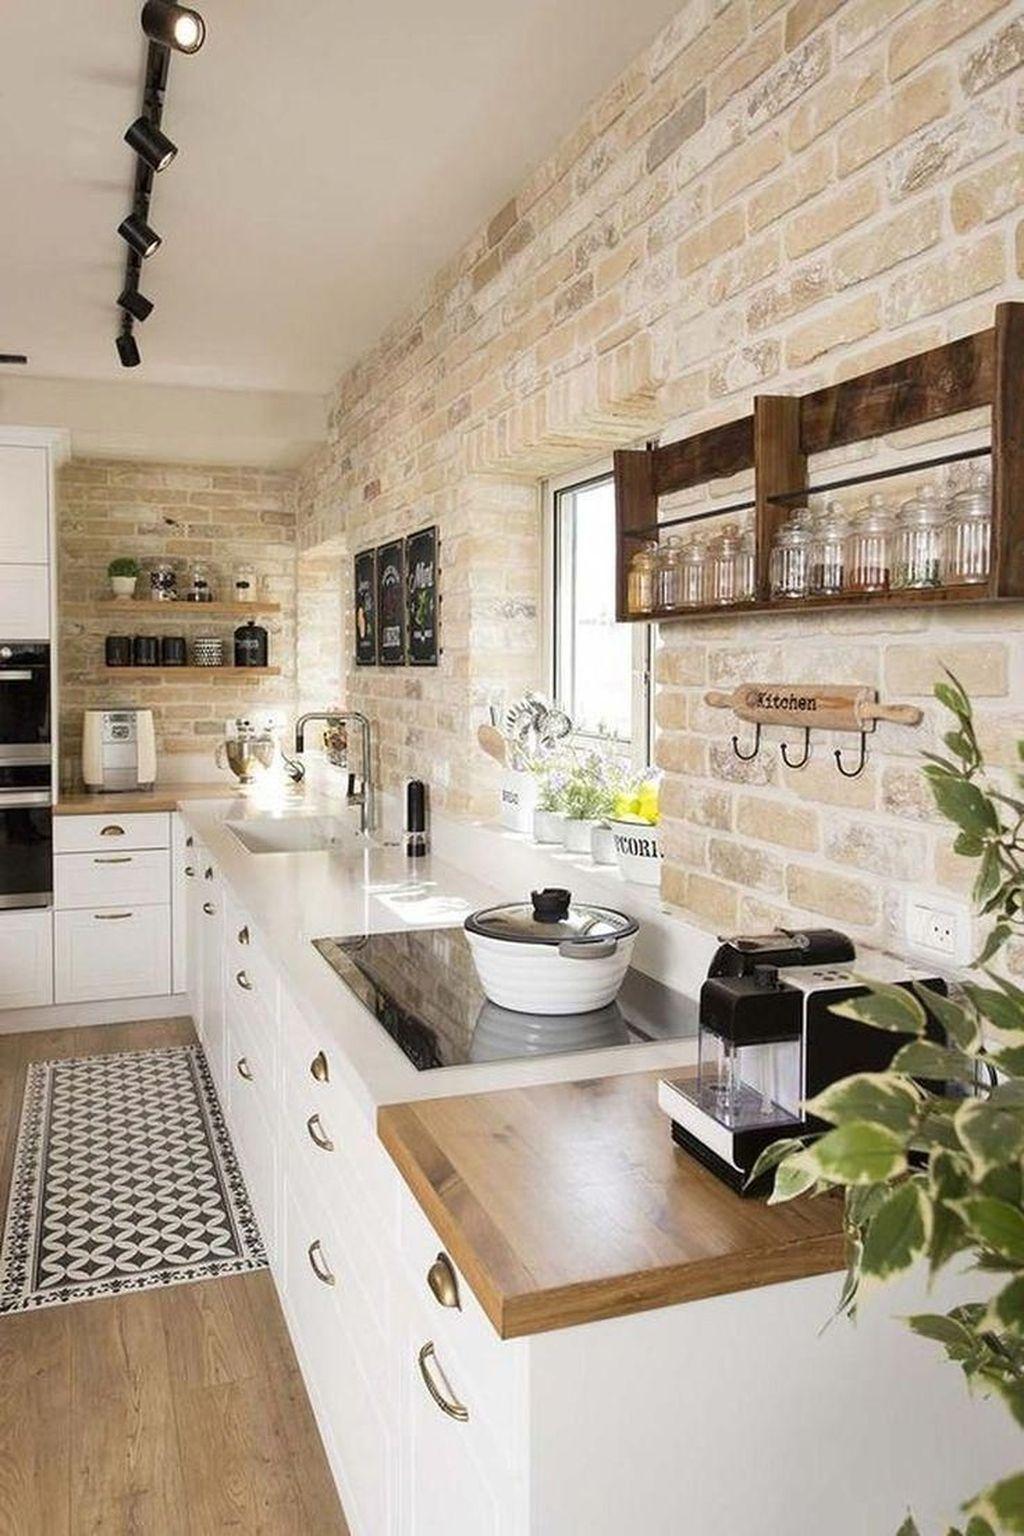 48 Inspiring Traditional Farmhouse Kitchen Decoration Ideas Kitchendesig Farmhouse Kitchen Colors Modern Farmhouse Kitchen Backsplash Farmhouse Kitchen Design